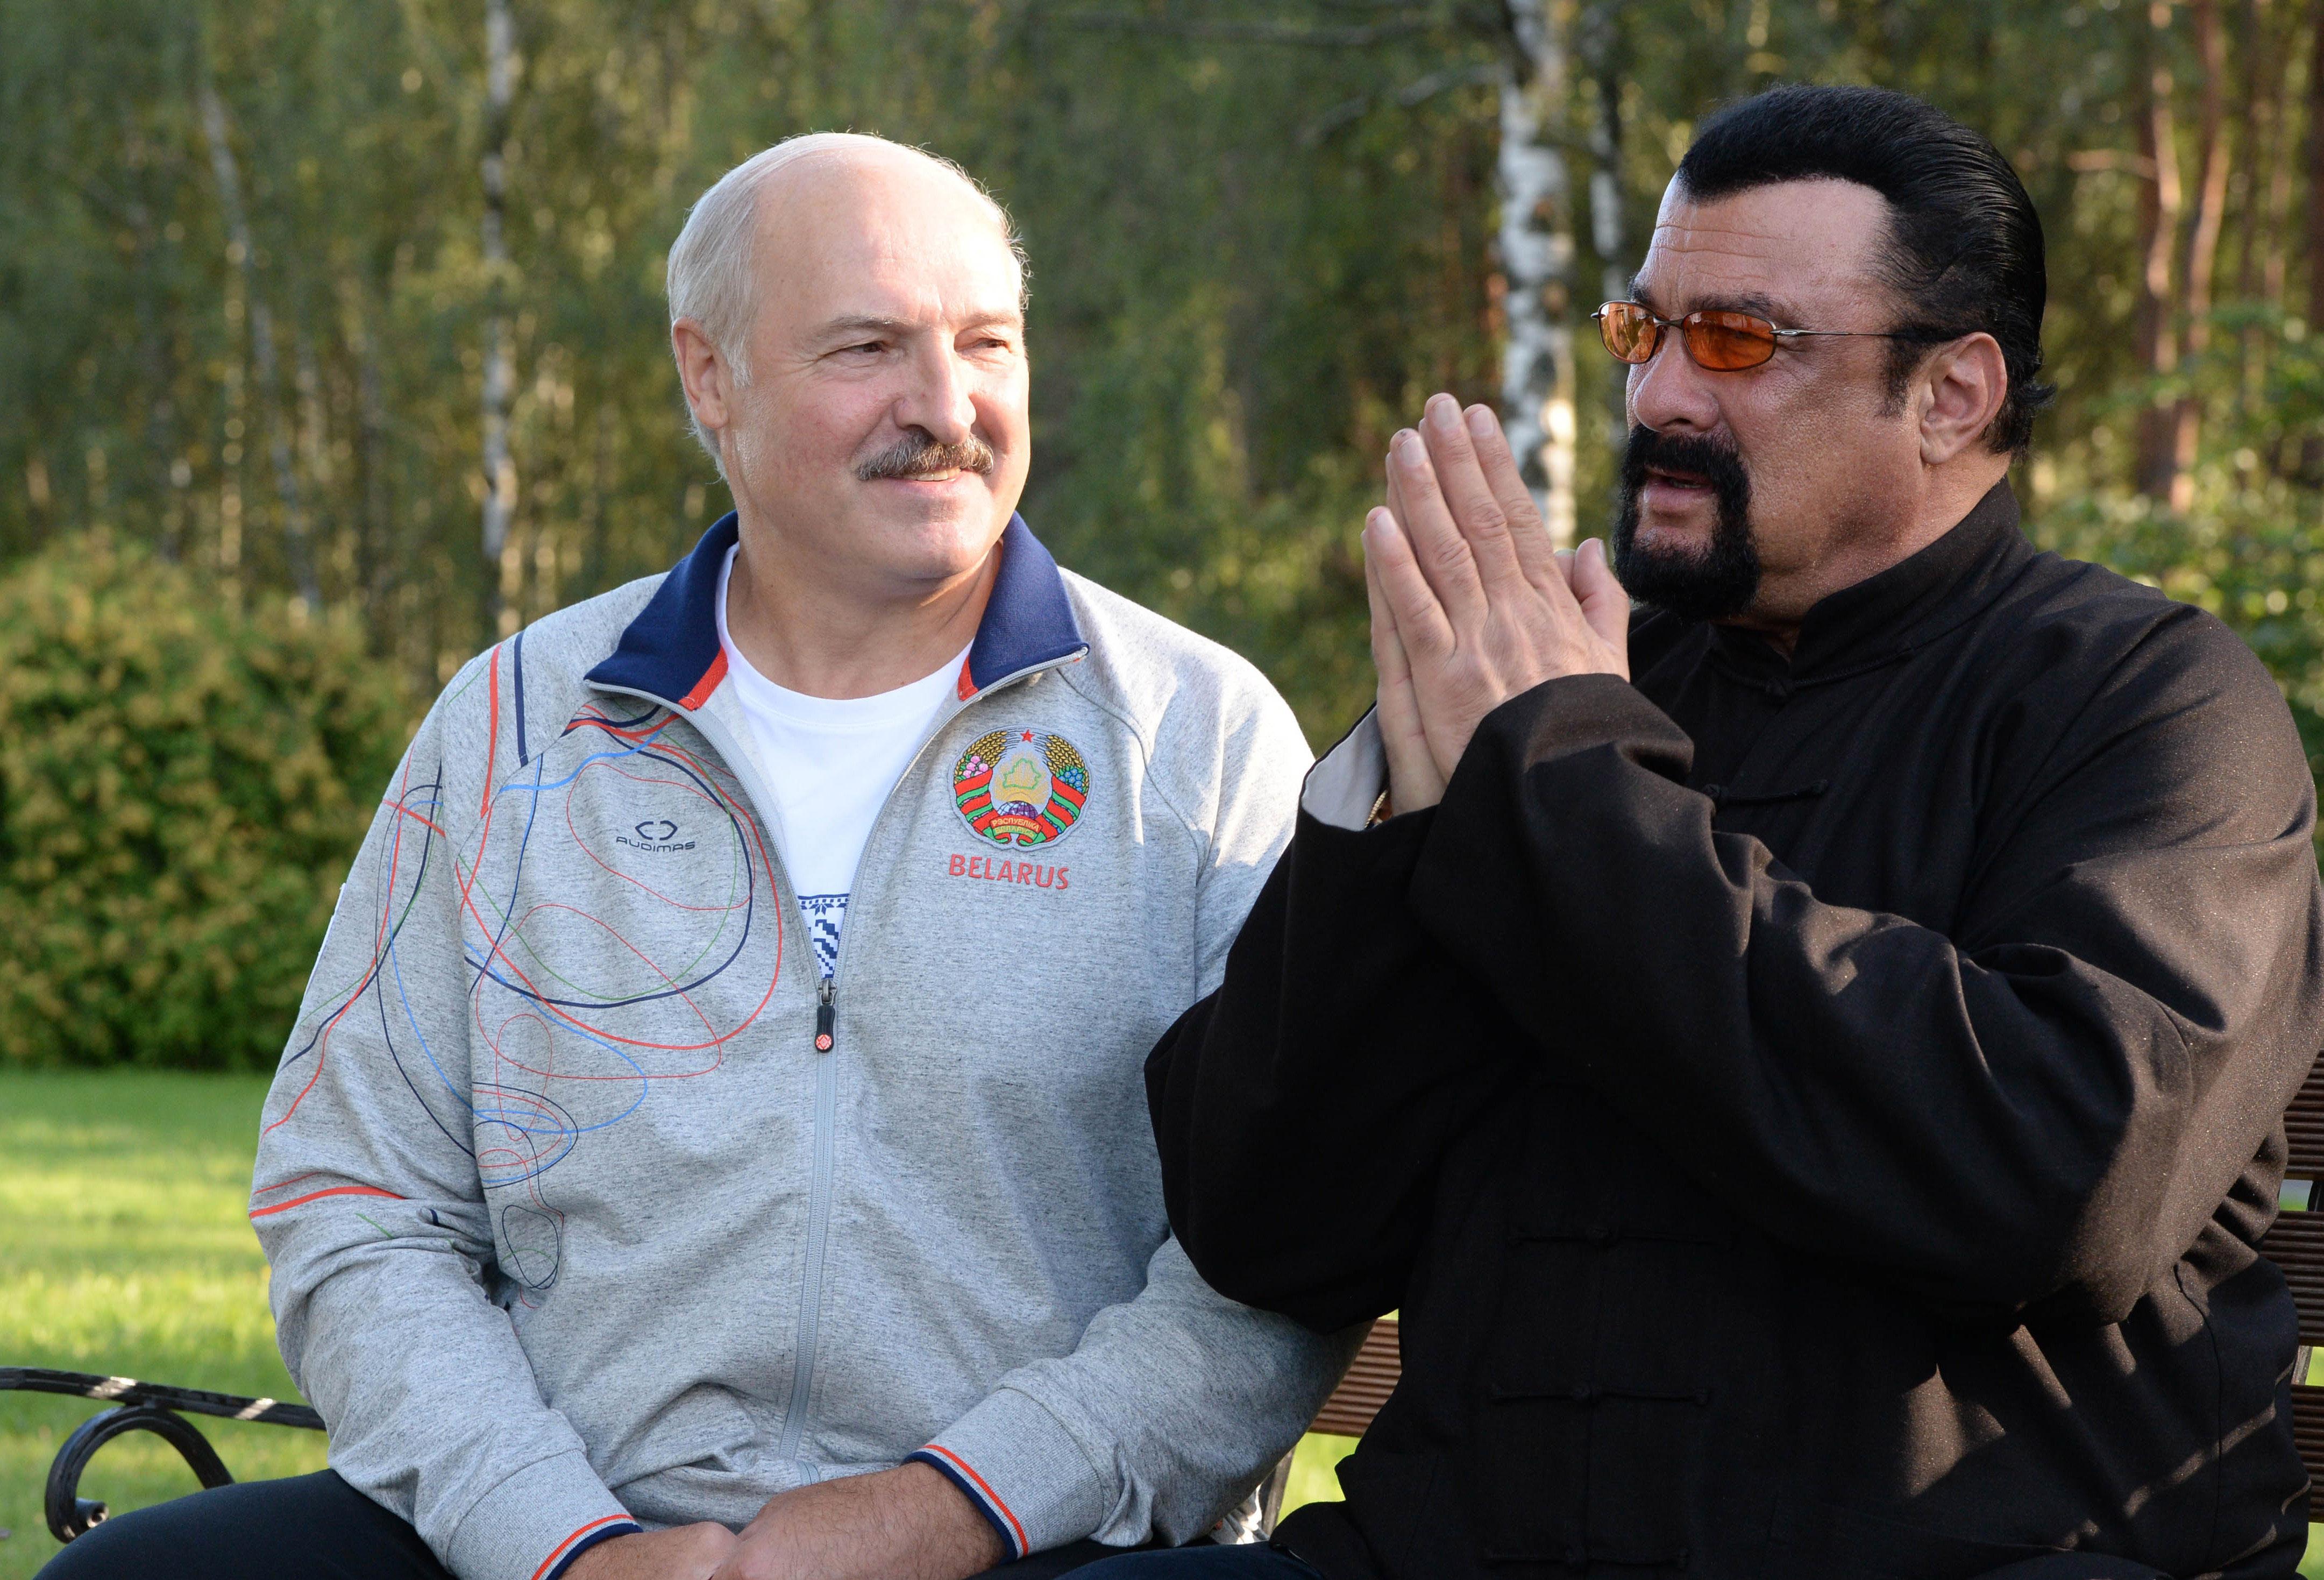 Steven Seagal and Belarus dictator Aleksandr Lukashenko